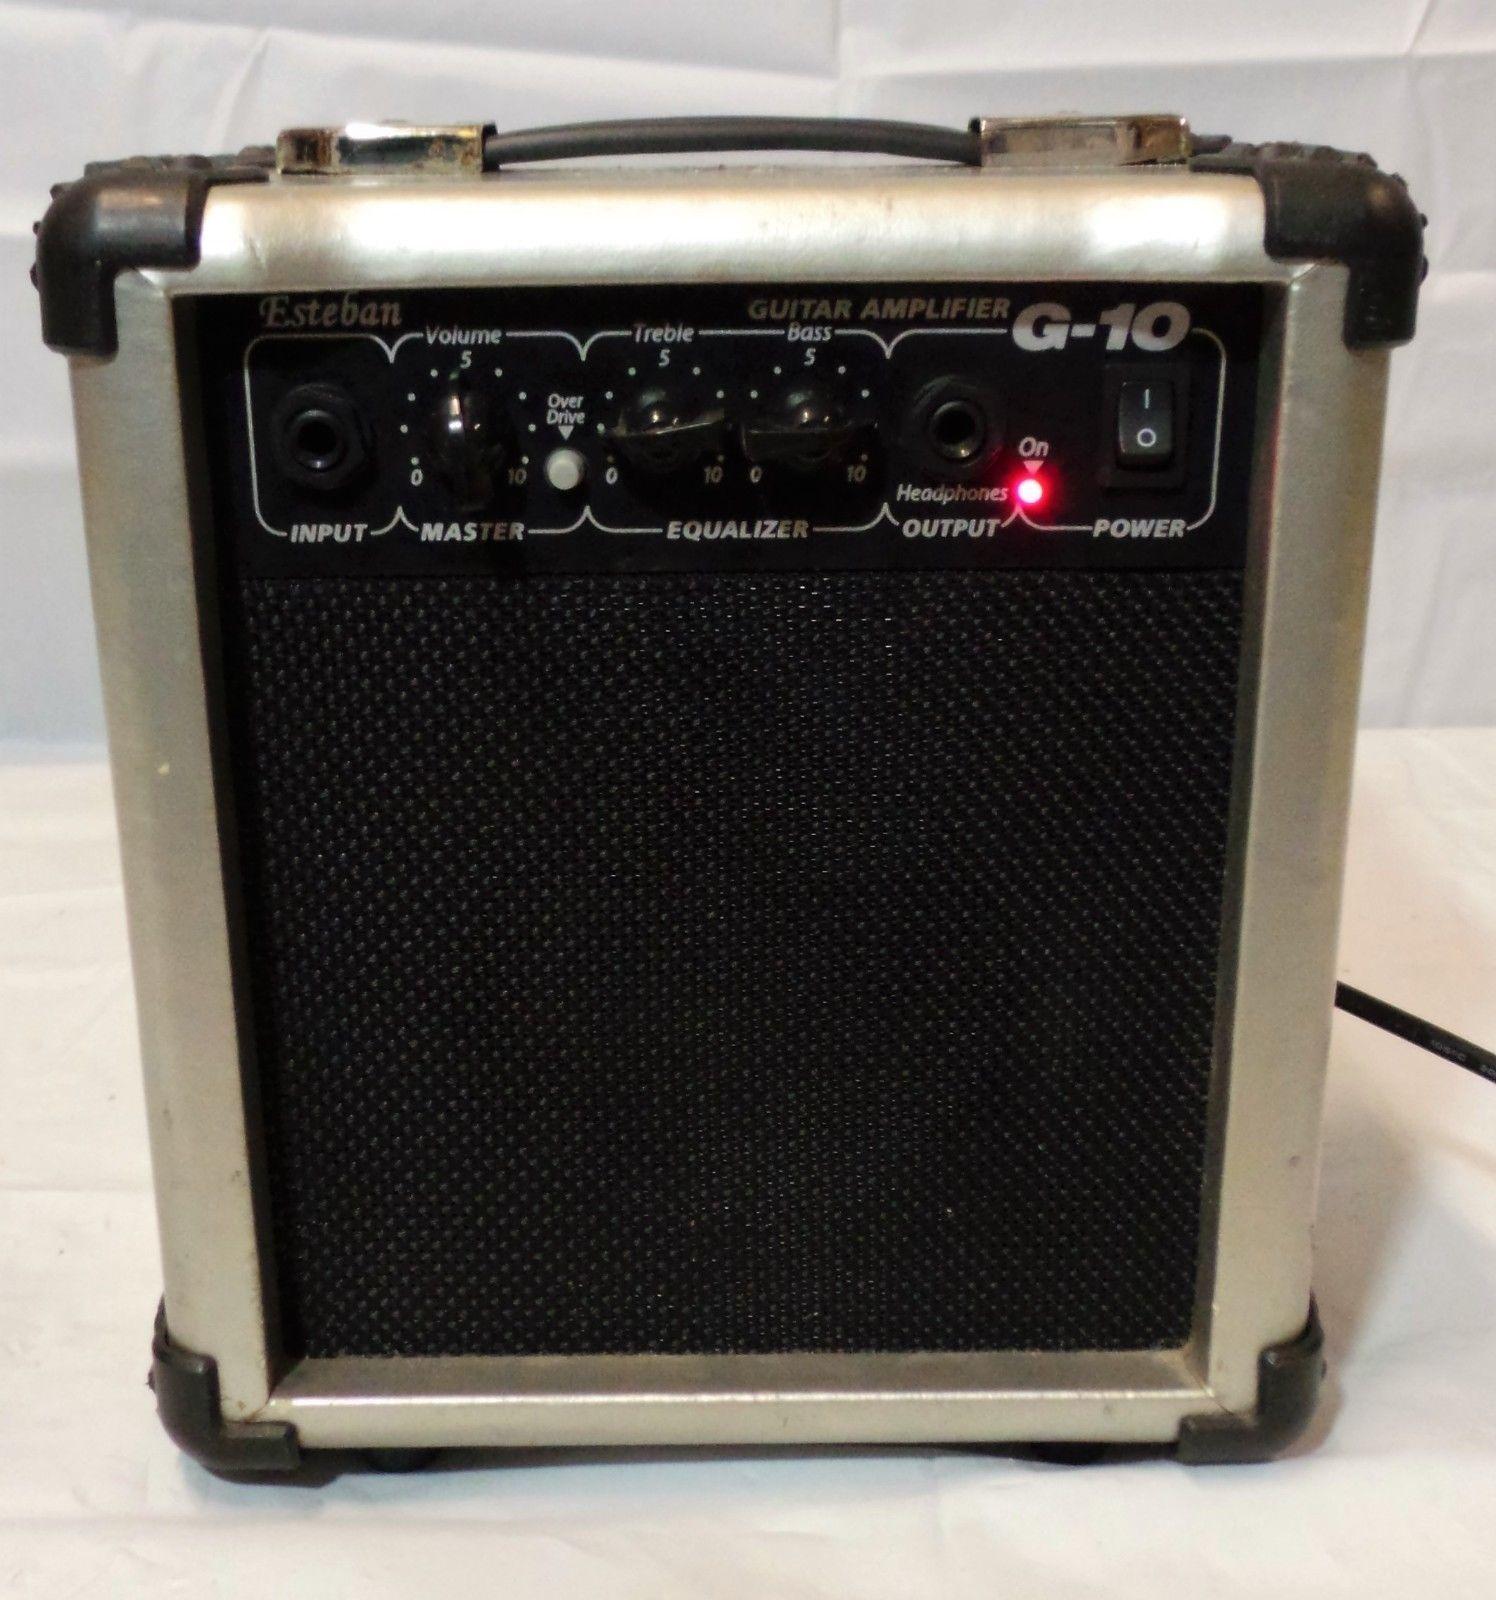 esteban g10 12 watt guitar amp amplifier electric acoustic music portable mobile please retweet [ 1496 x 1600 Pixel ]